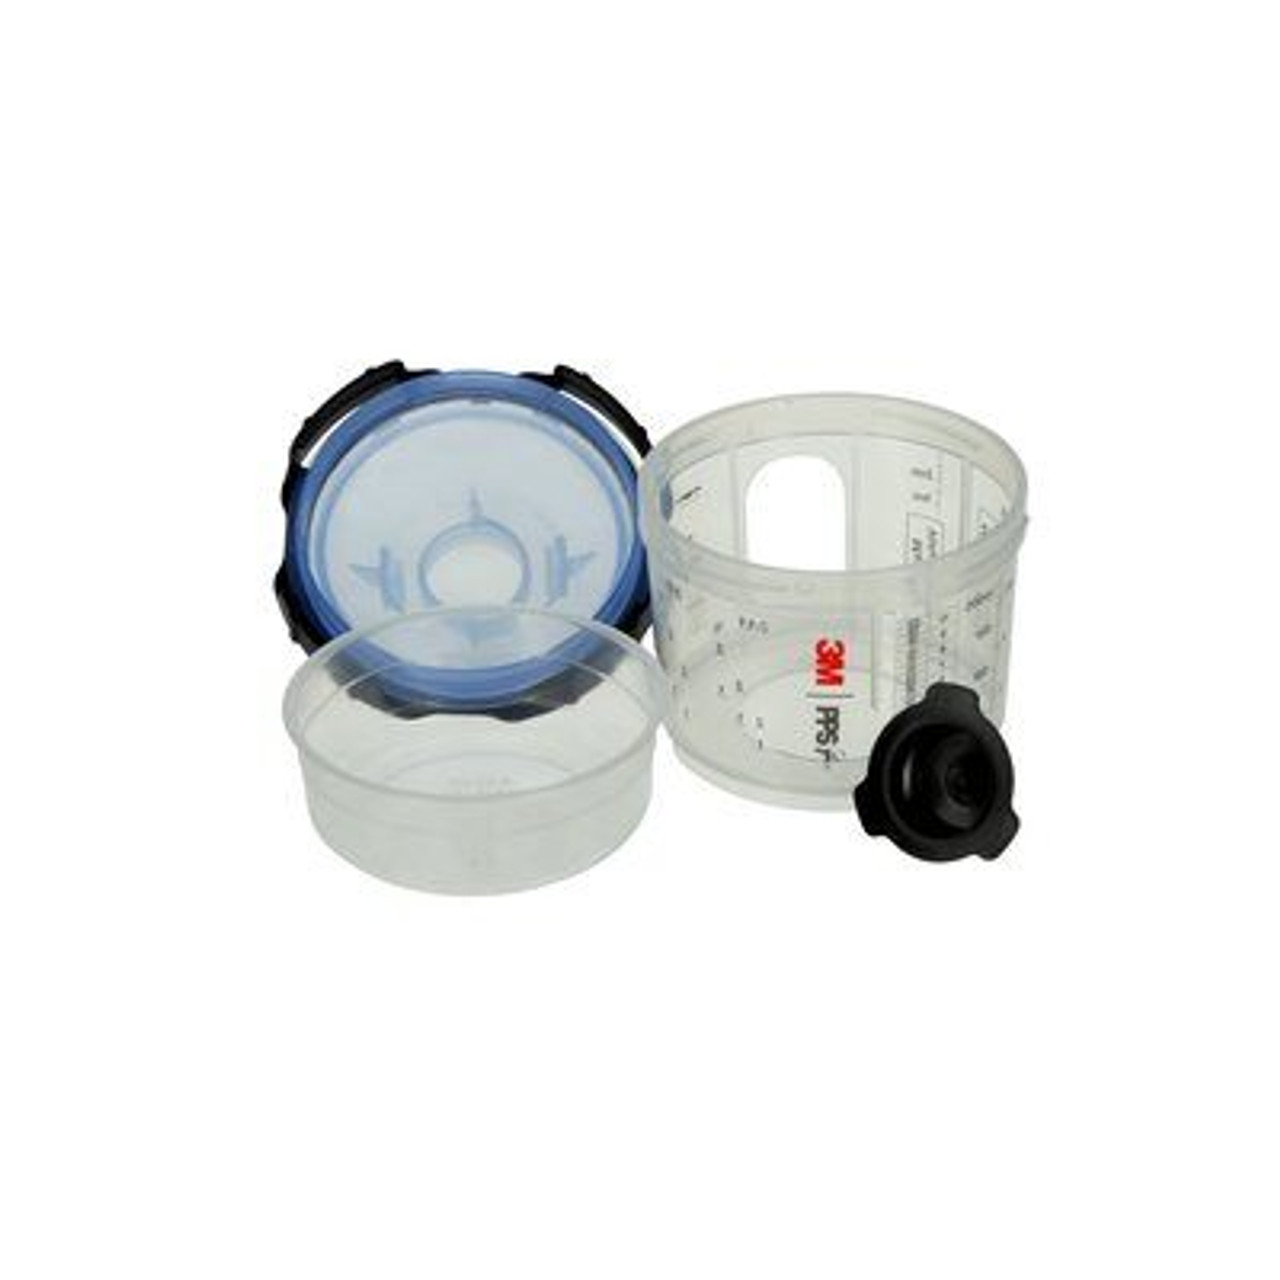 3M™ PPS™ Series 2.0 Spray Cup System Kit, 26328, Micro (3 fl oz, 90 mL), 125 Micron Filter, 1 kit per case